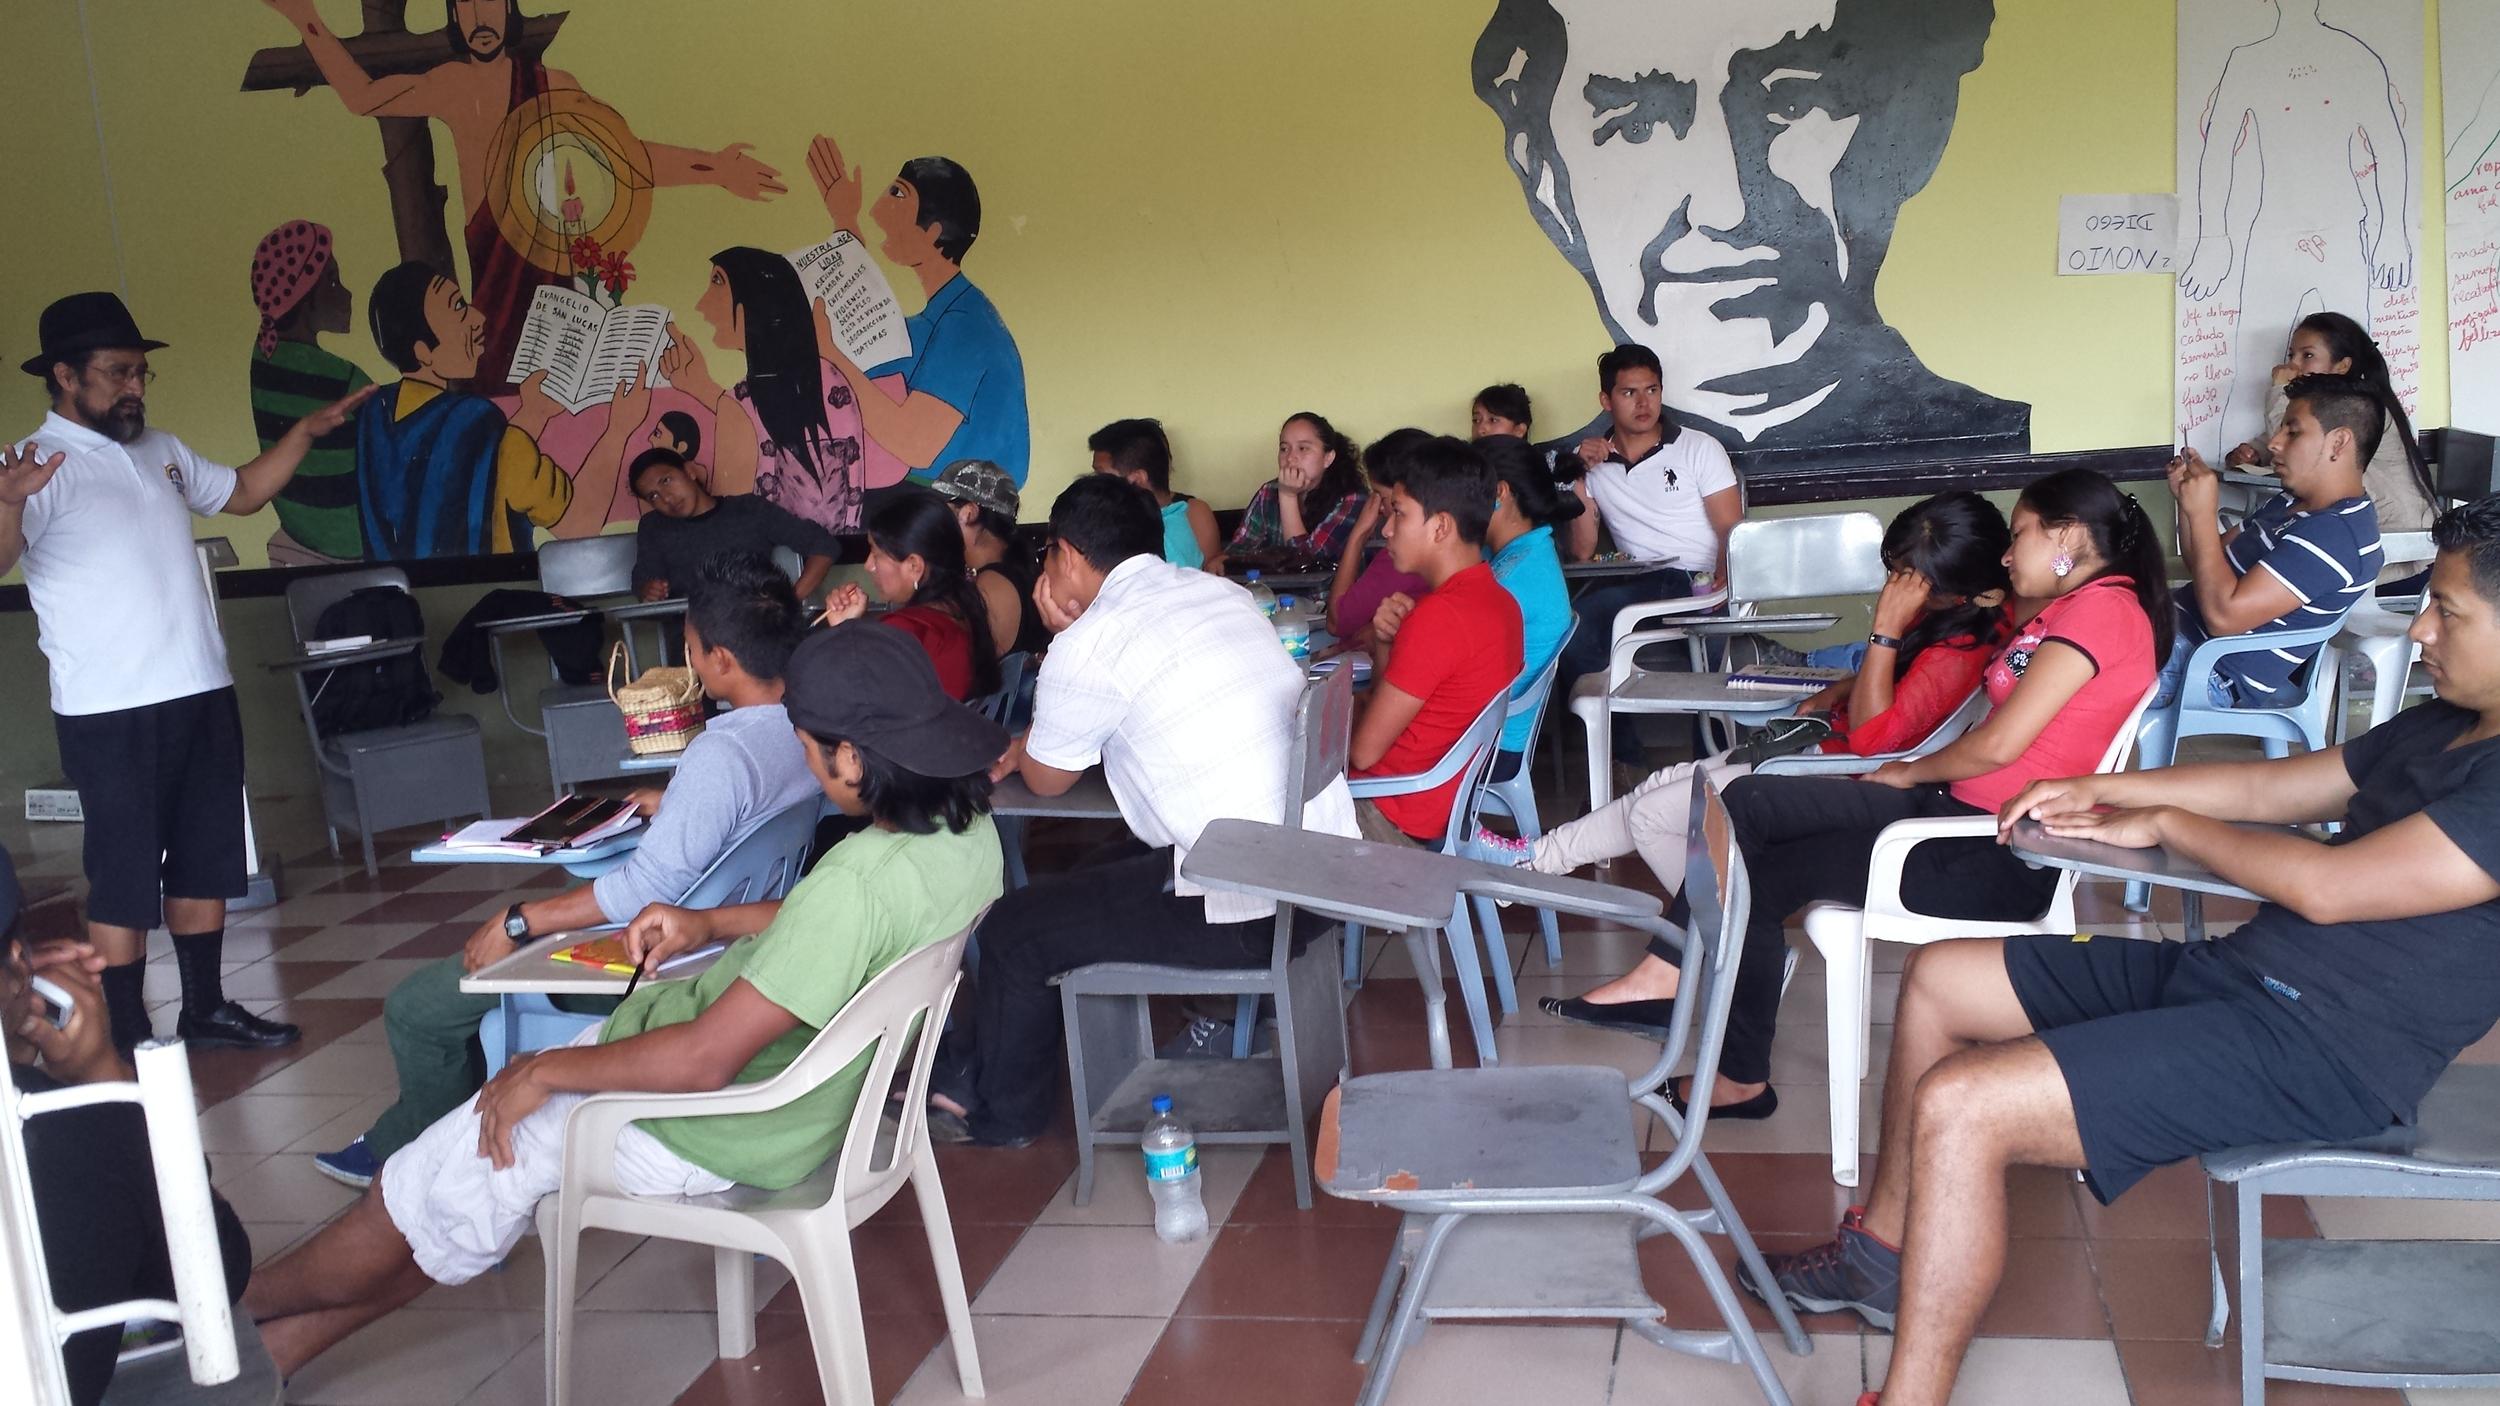 Taller de comunicación comunitaria (  Zamora- Guadalupe)    jóvenes bachilleres de diferentes organizaciones, asistieron talleres de formación de líderes y líderesas